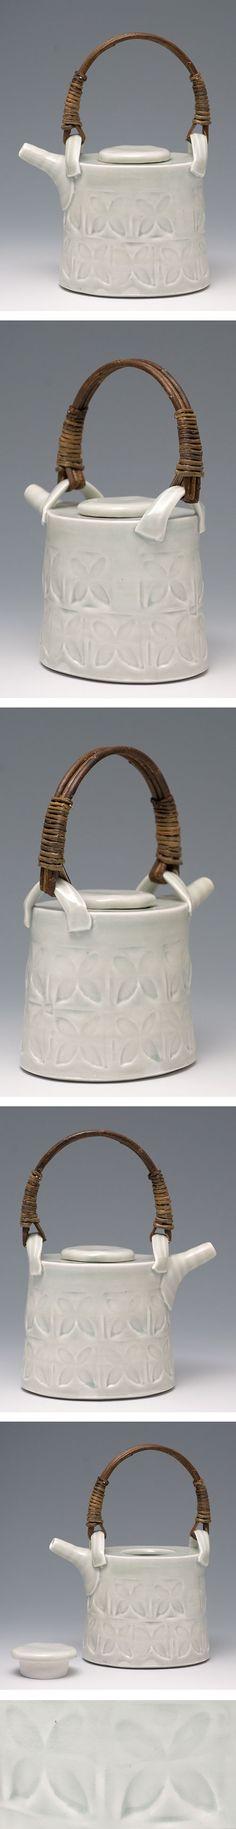 Anne Mette Hjortshøj. A wonderful potter.